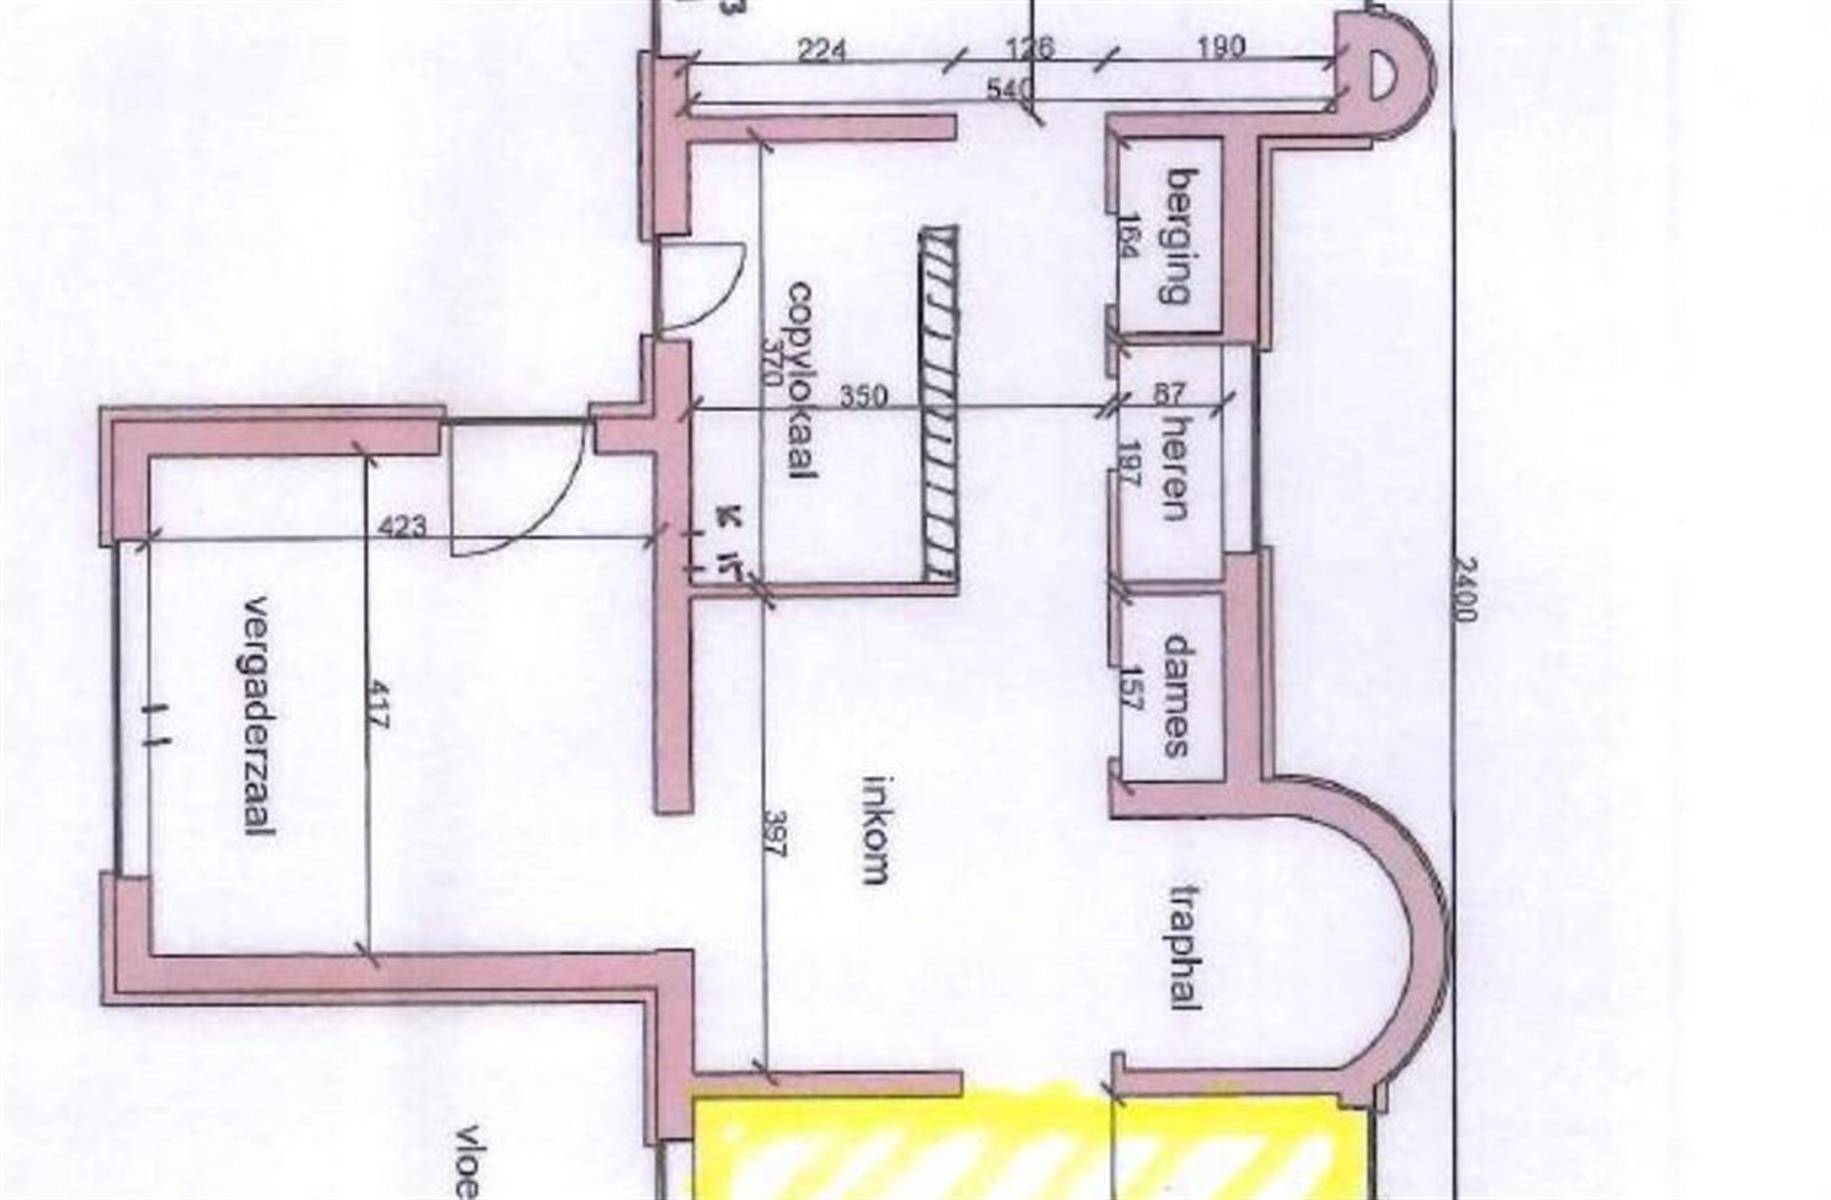 kantoor te huur K003 - Middelmolenlaan 96, 2100 Antwerpen Deurne, België 20